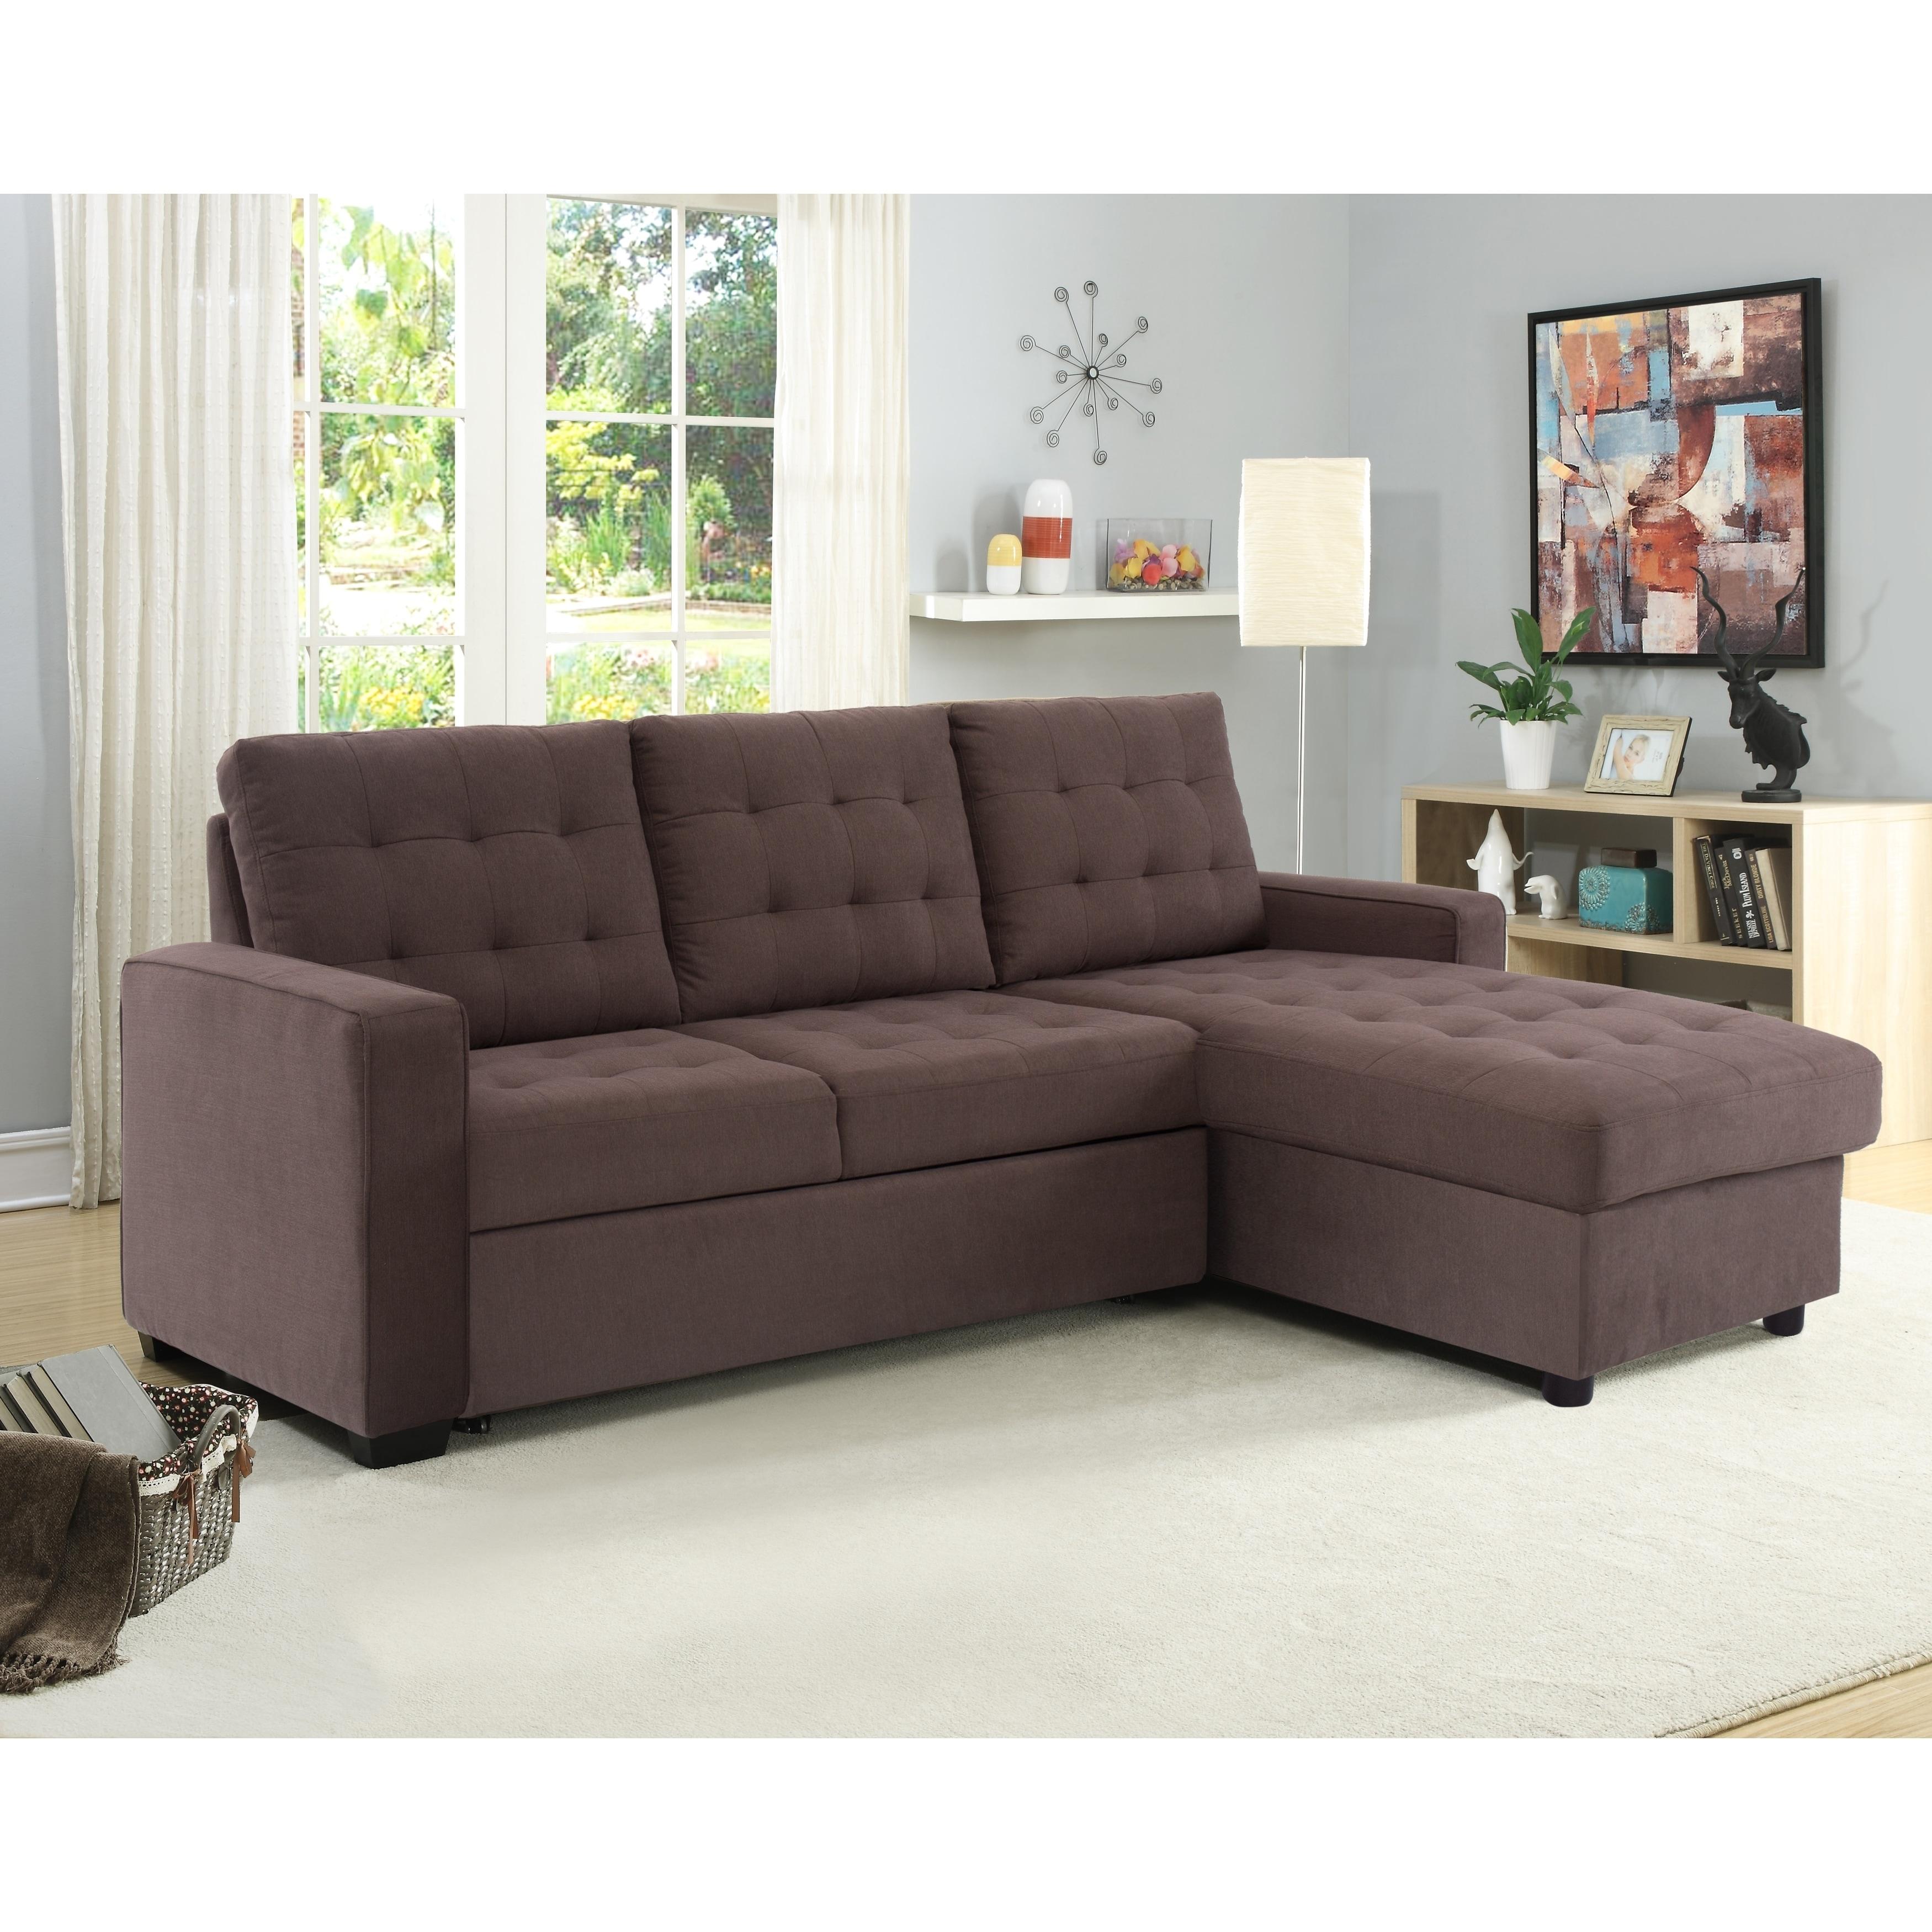 Serta Bradley Convertible Sofa and Chaise